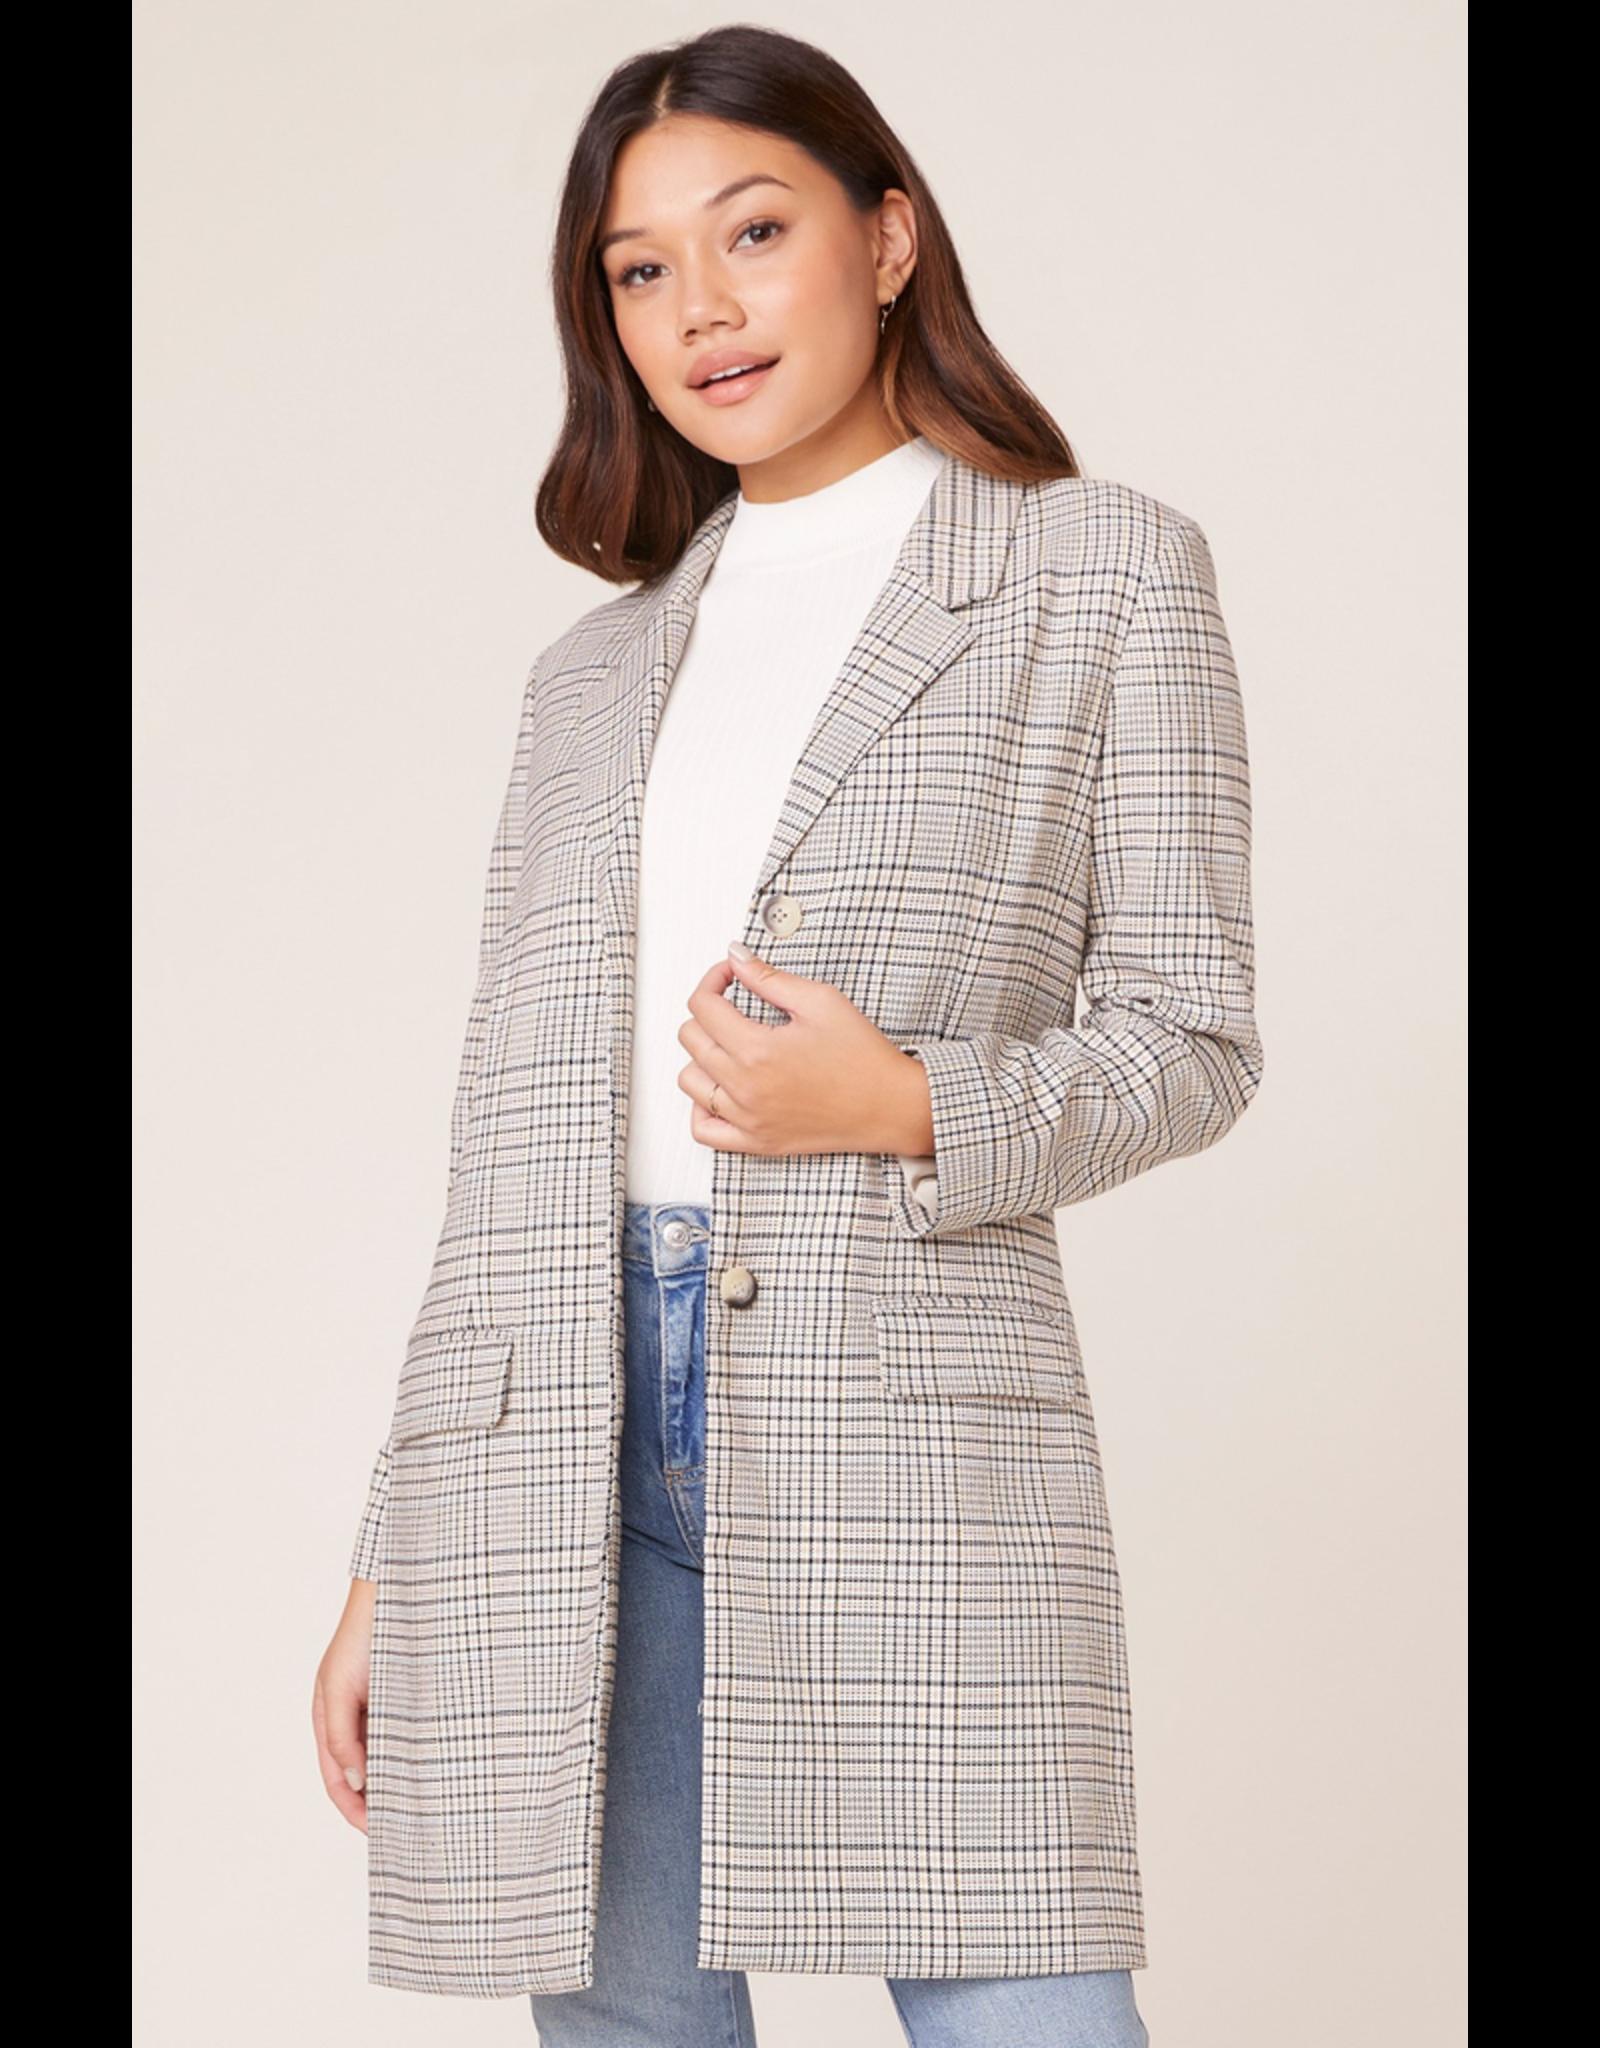 bb dakota bb dakota plaid reputation jacket